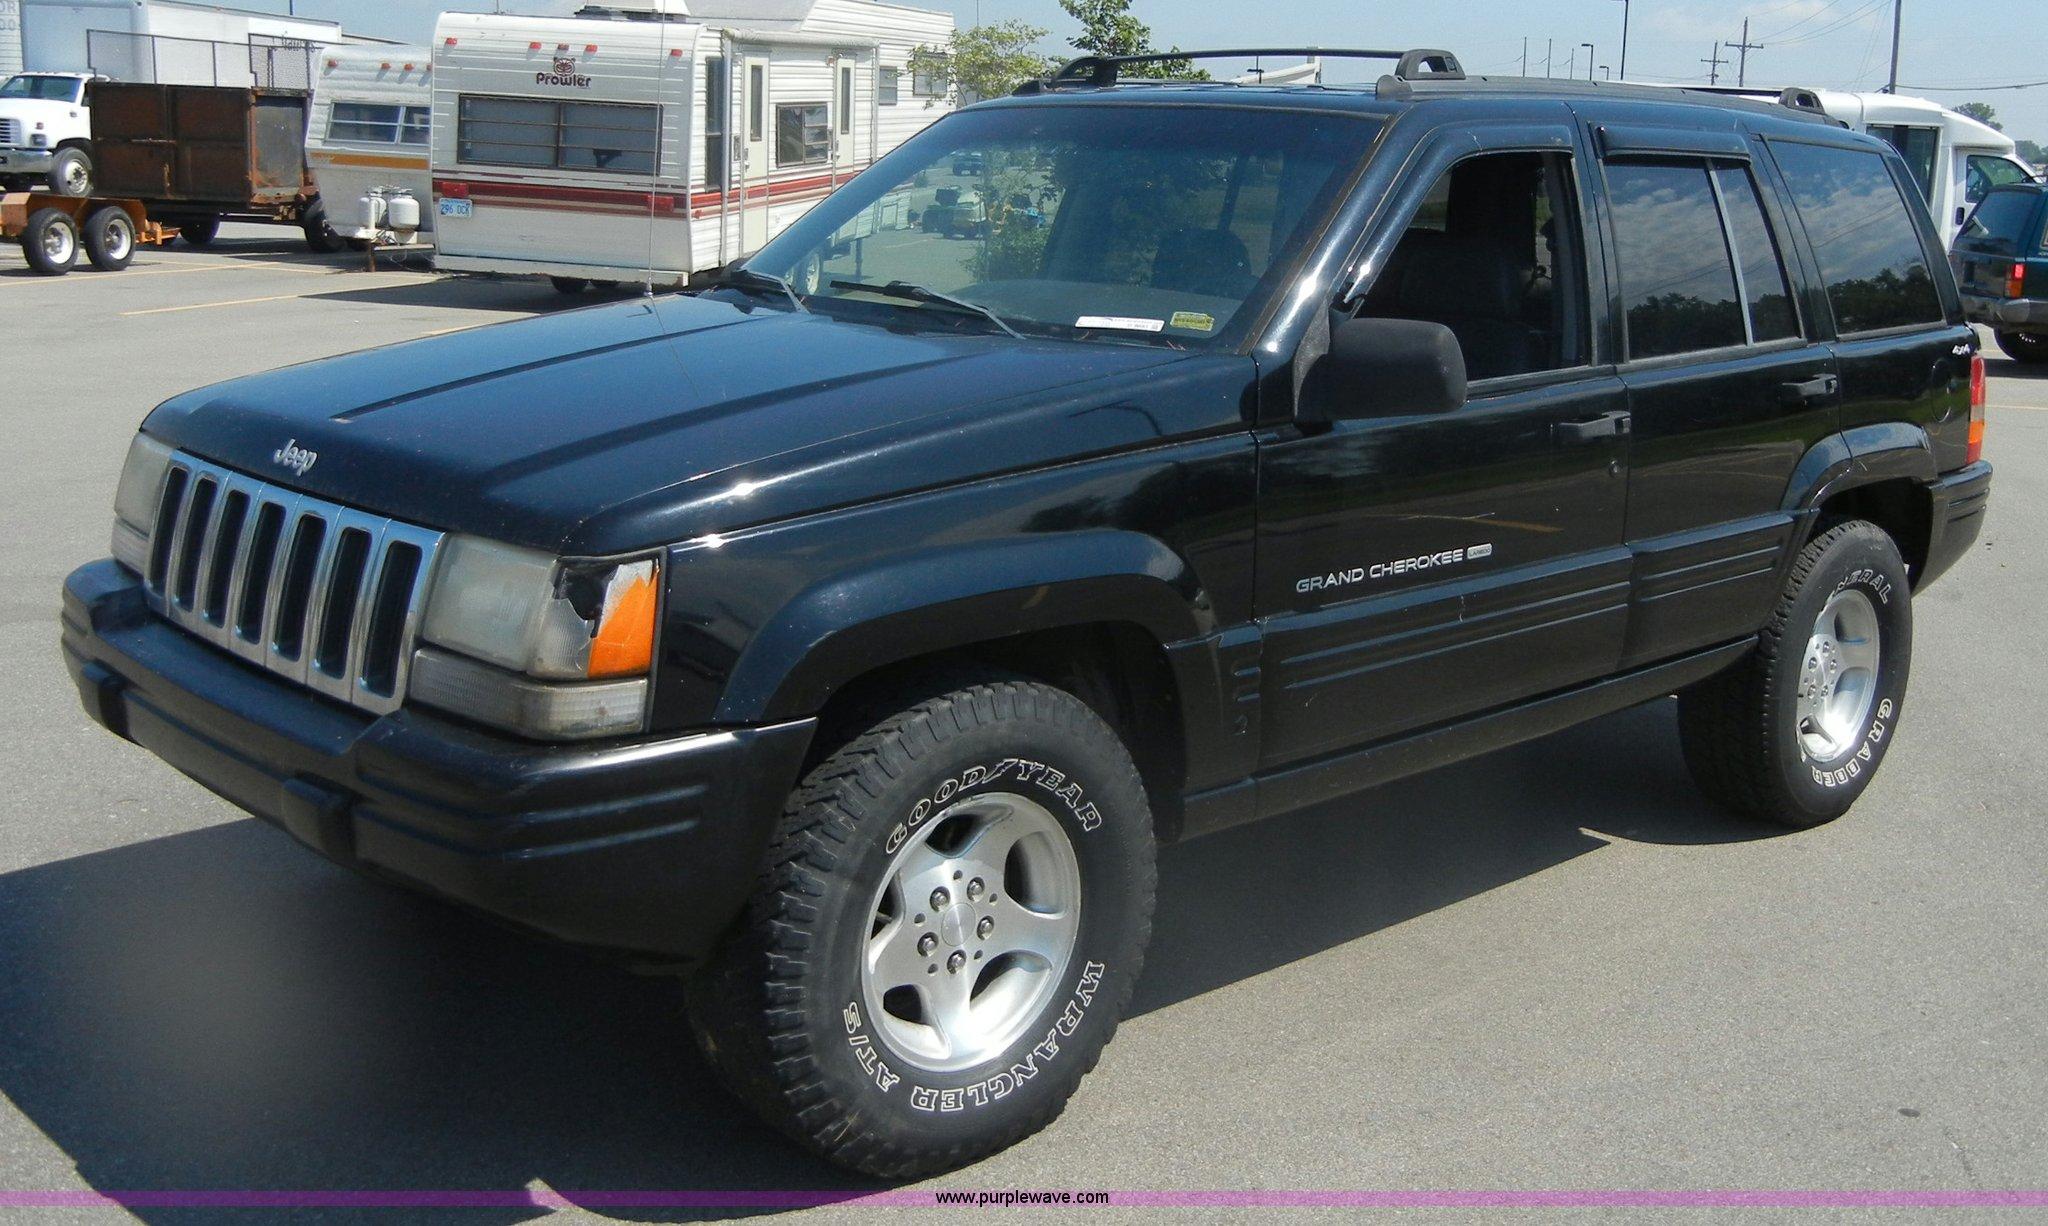 1998 Jeep Grand Cherokee Laredo >> 1998 Jeep Grand Cherokee Laredo Se Suv Item D9683 Sold